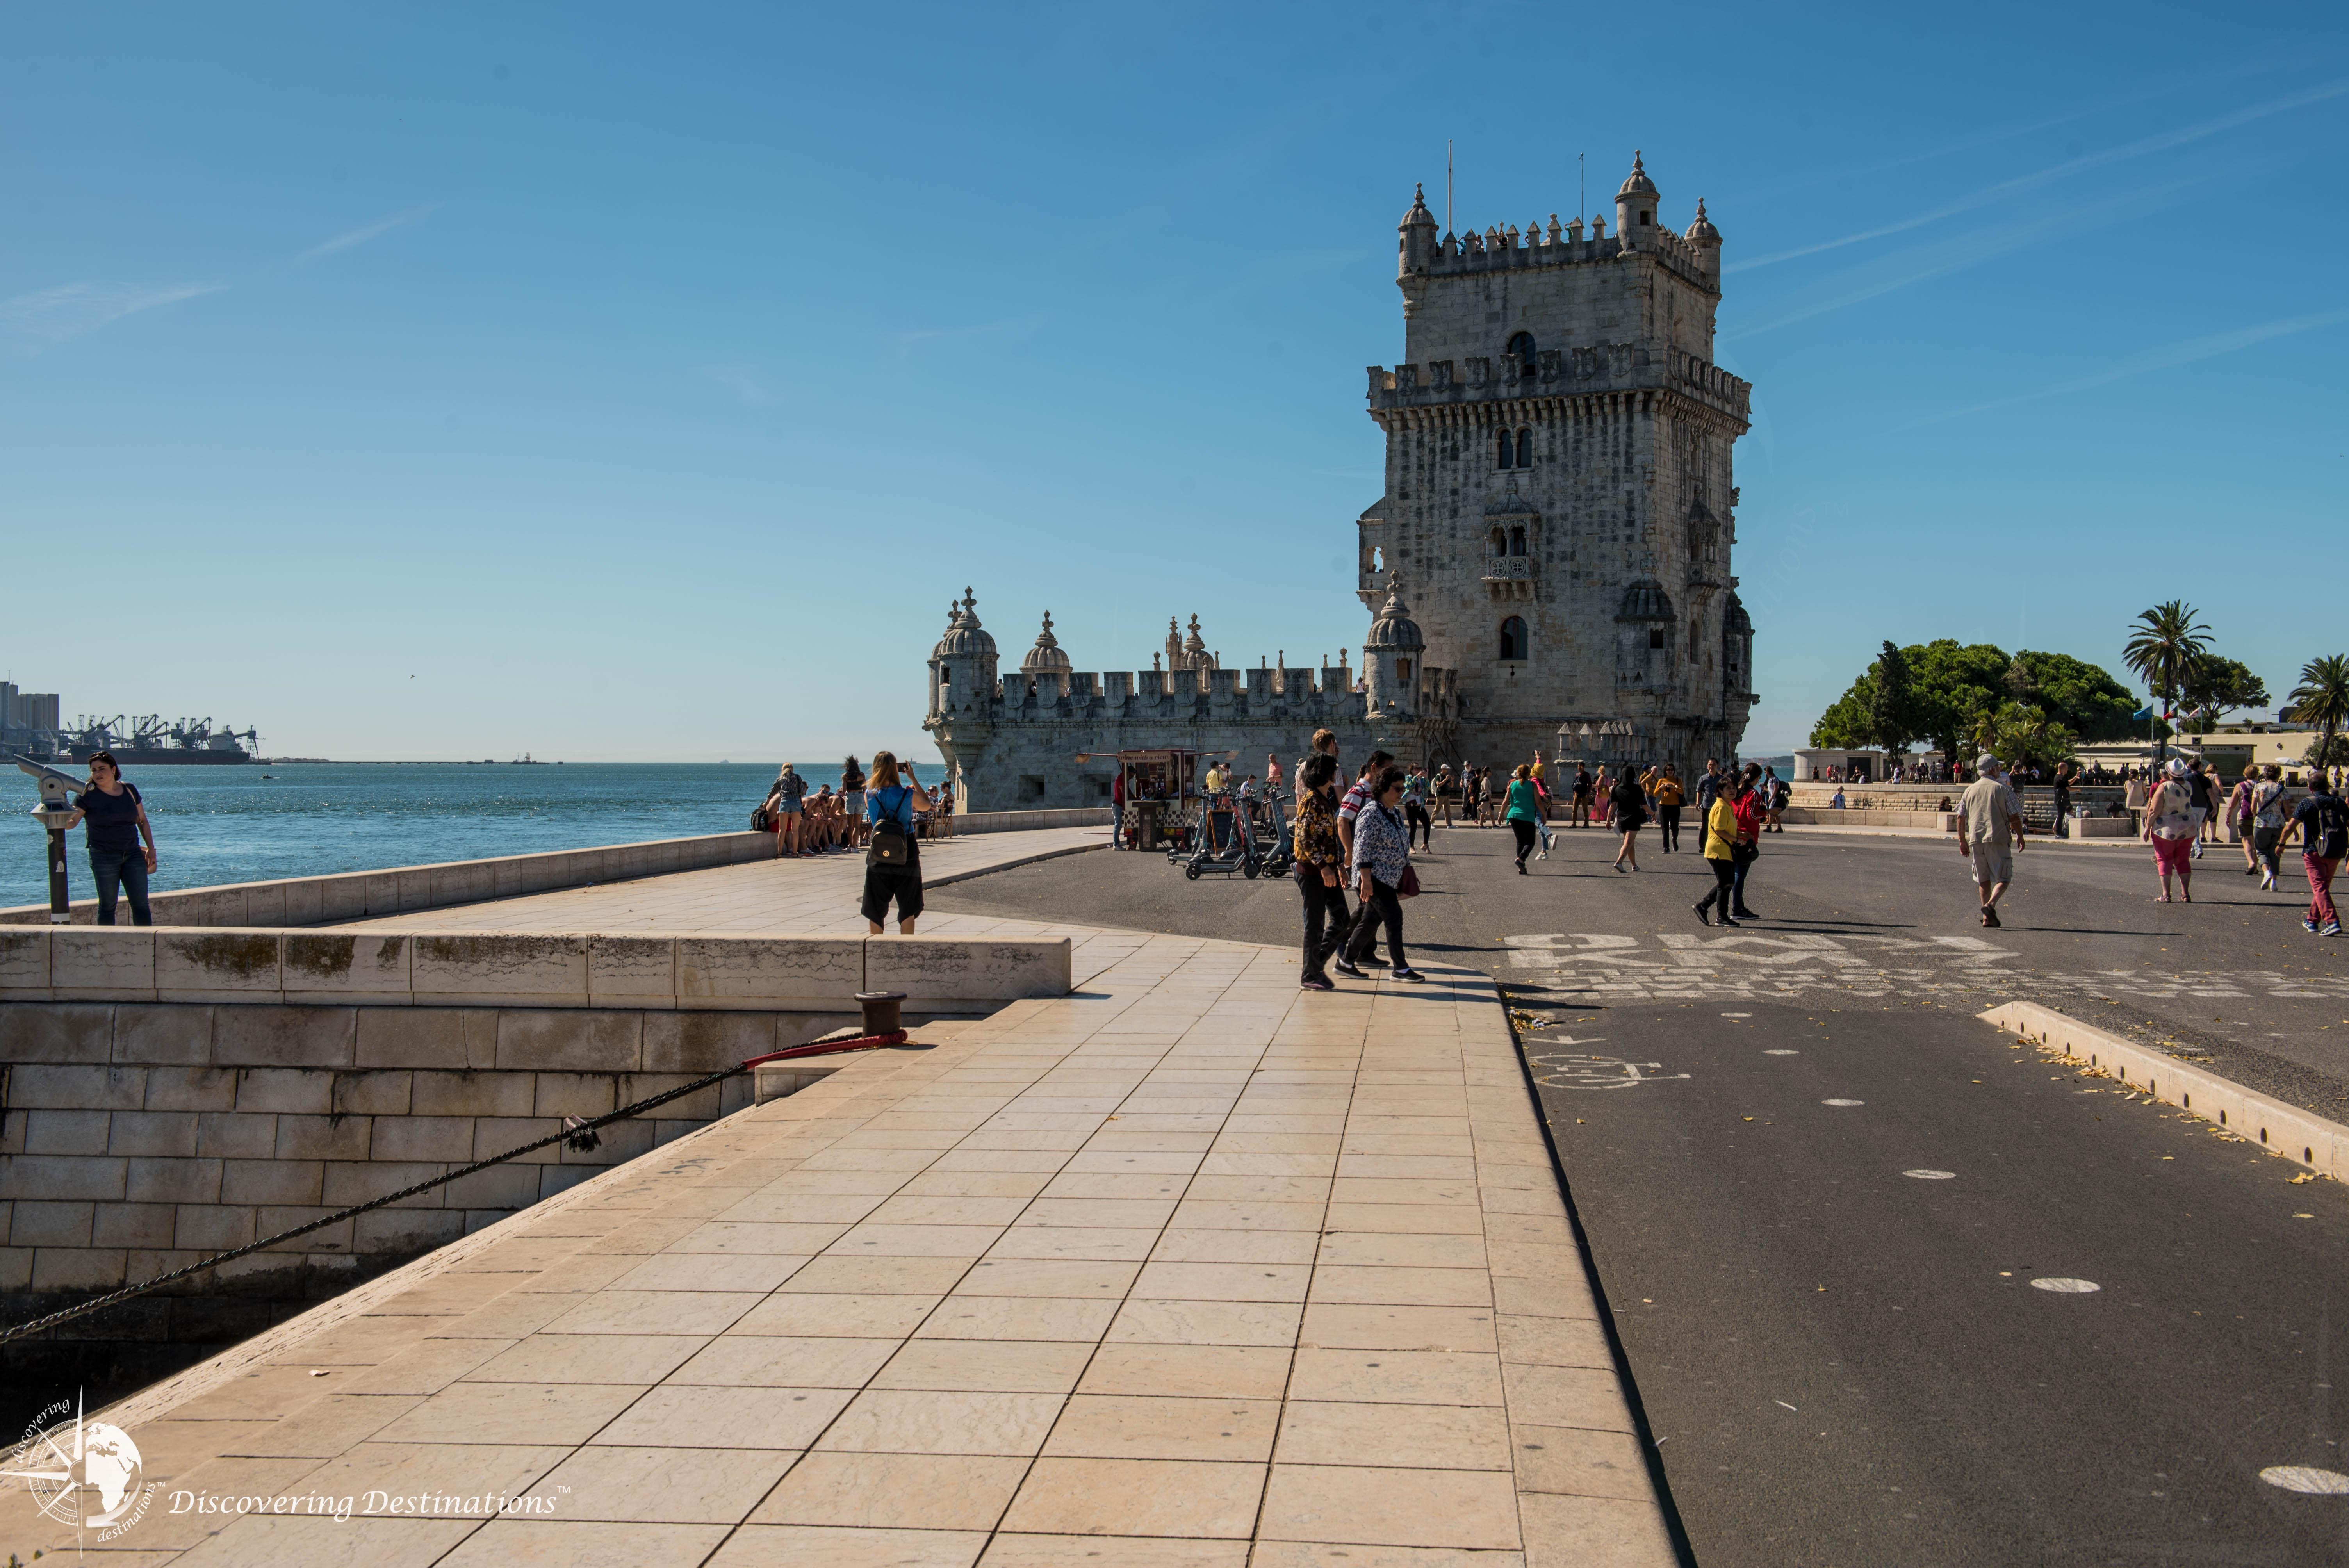 Boardwalk with Belém tower